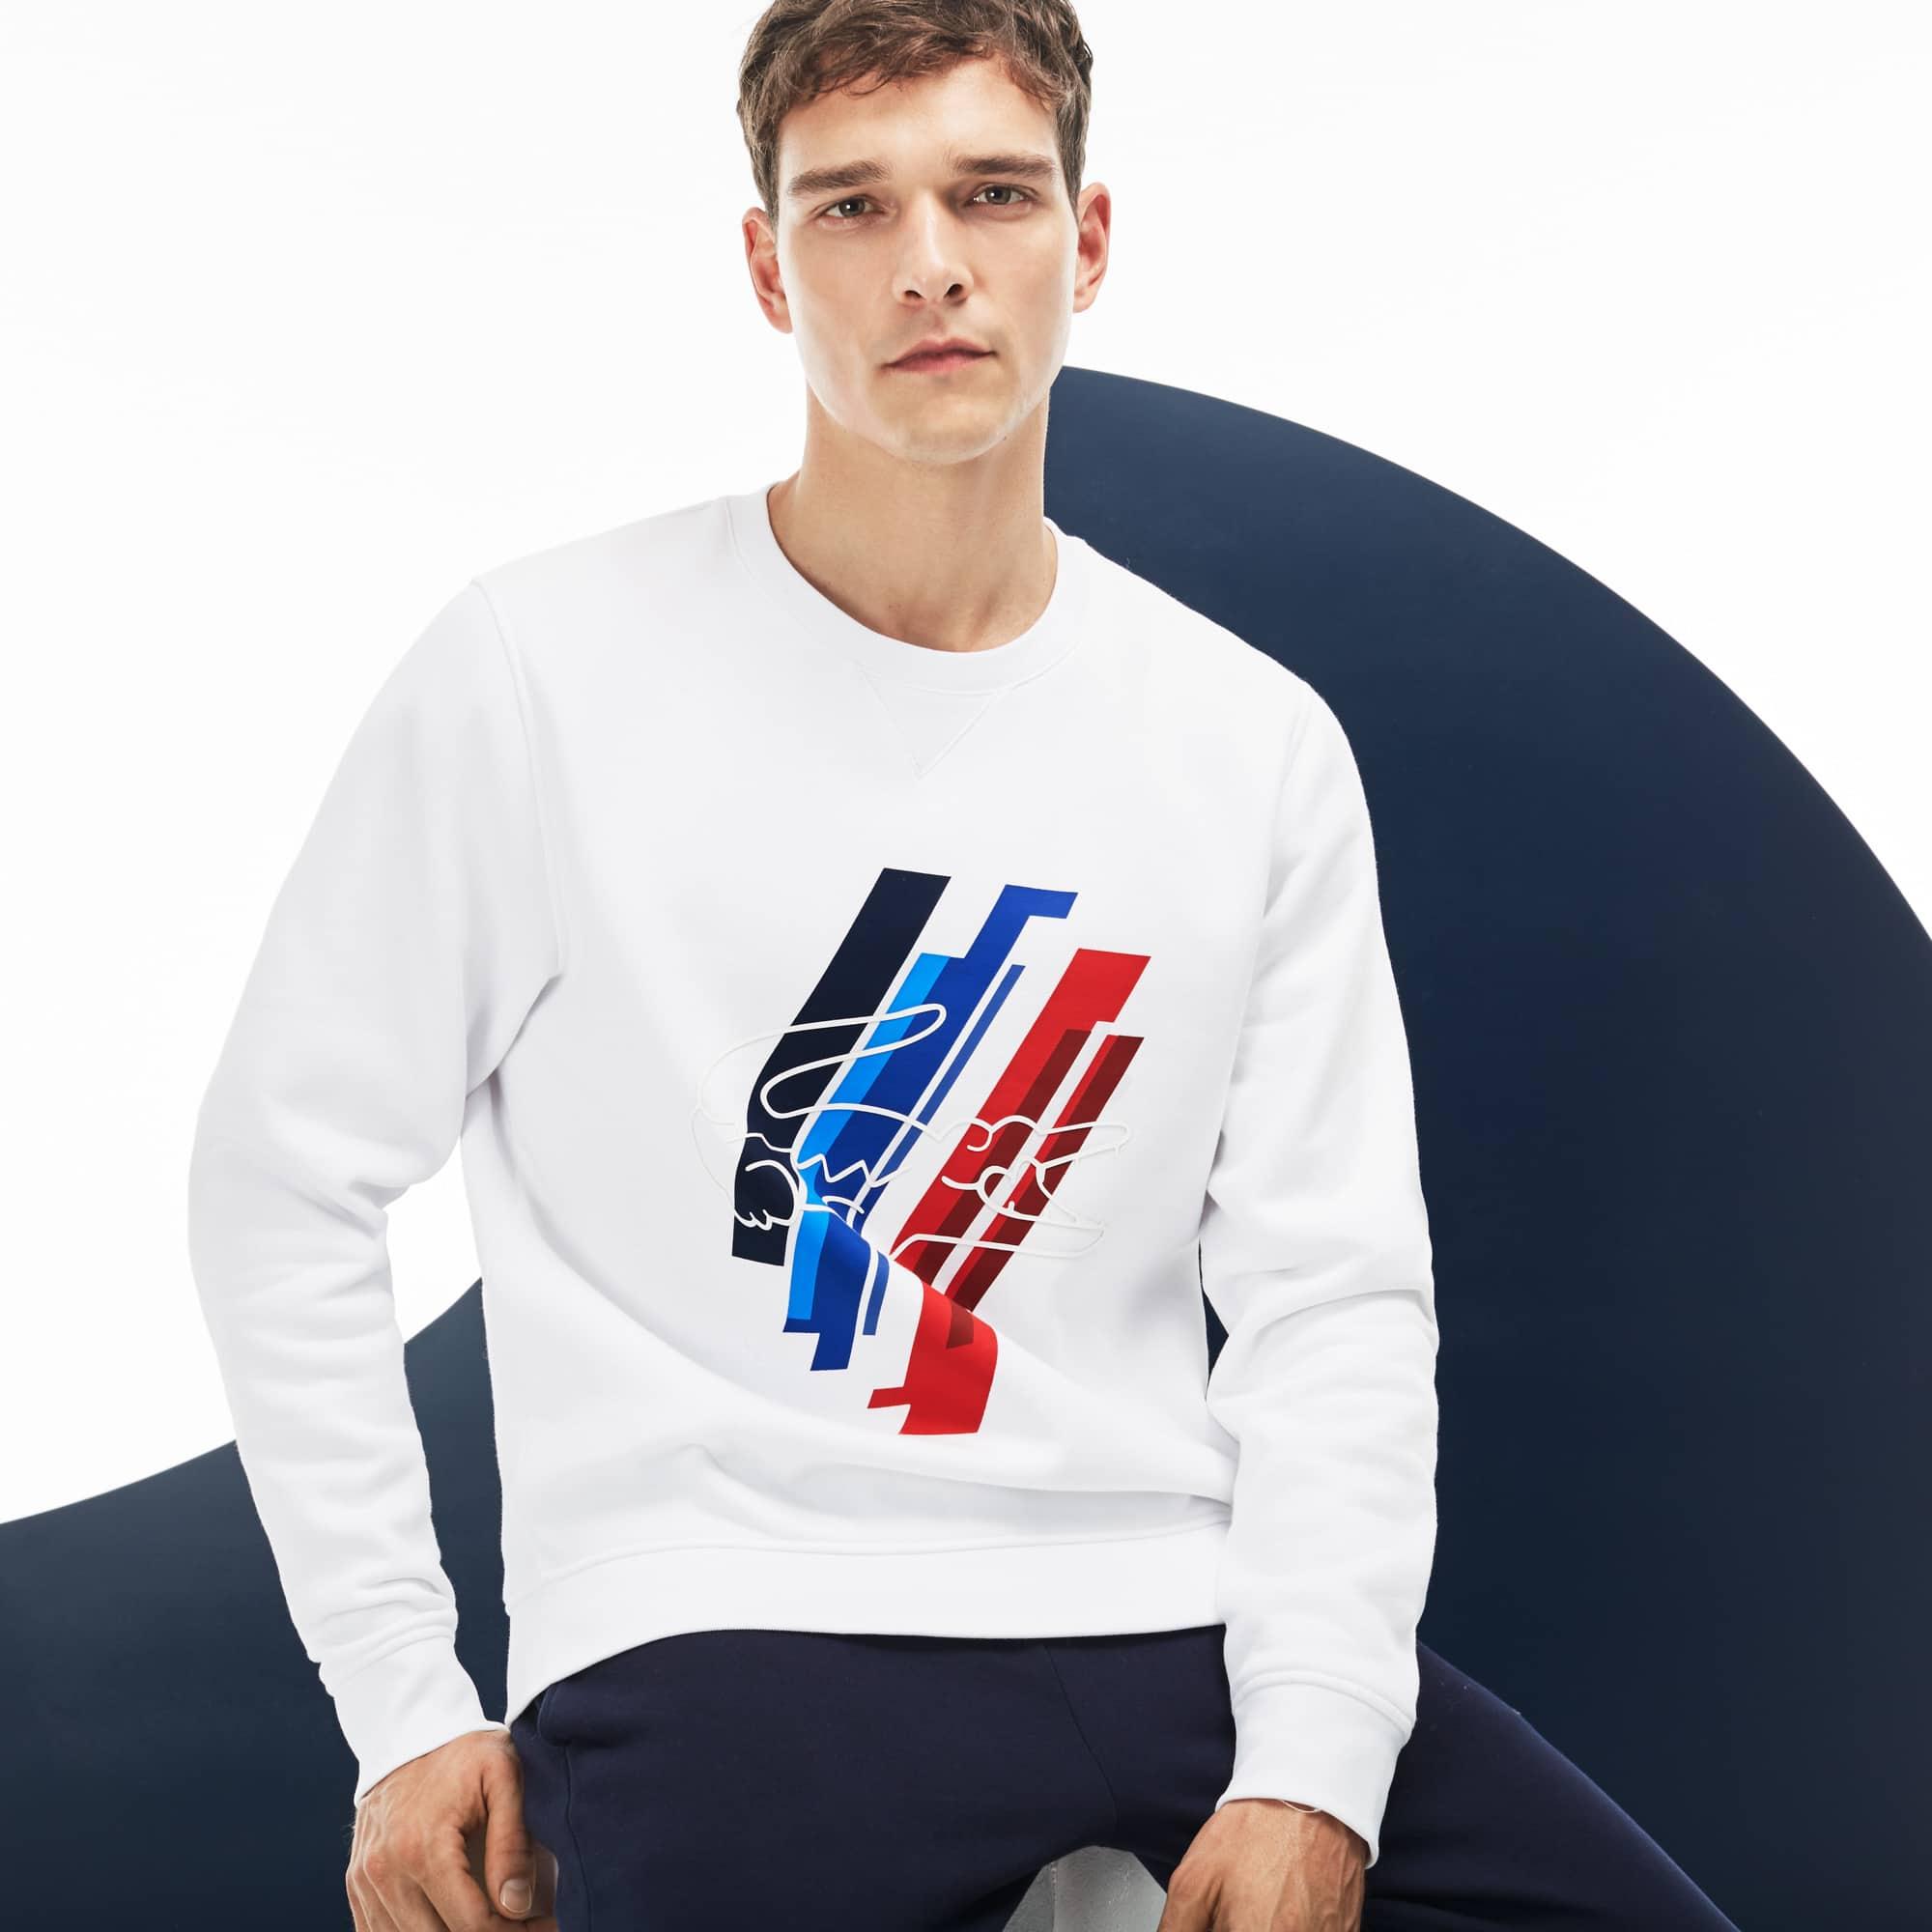 Men's Lacoste SPORT COLLECTION TRICOLORE Edition Print Fleece Sweatshirt